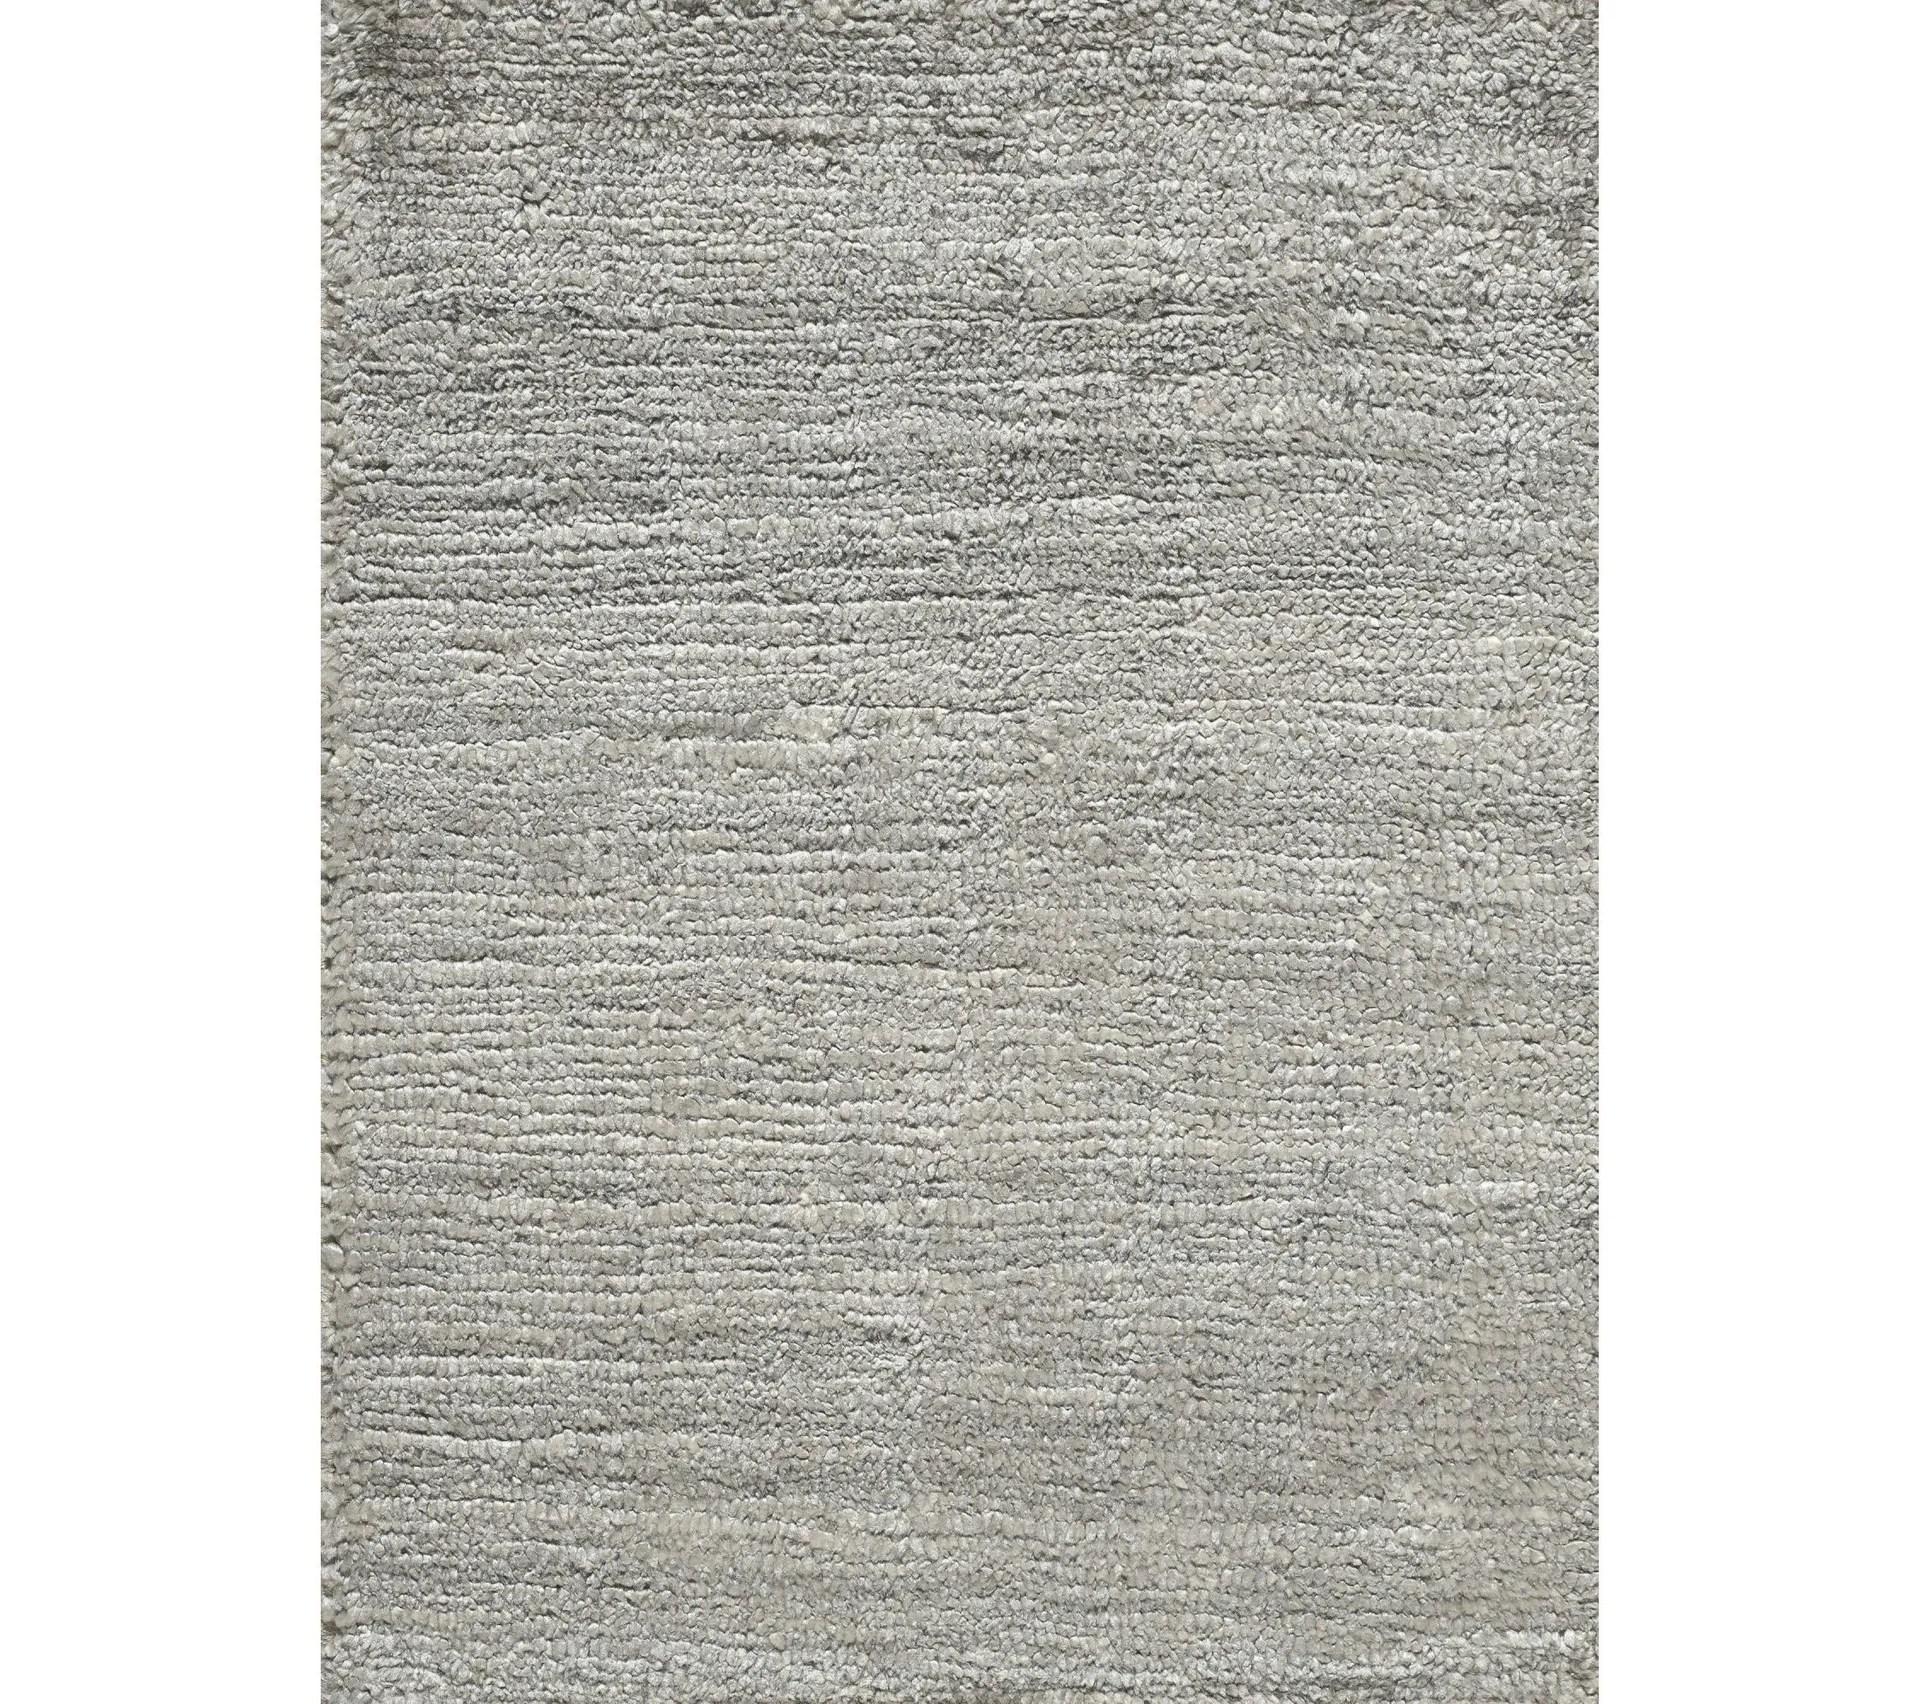 tapis silky gris clair 200 x 300 cm